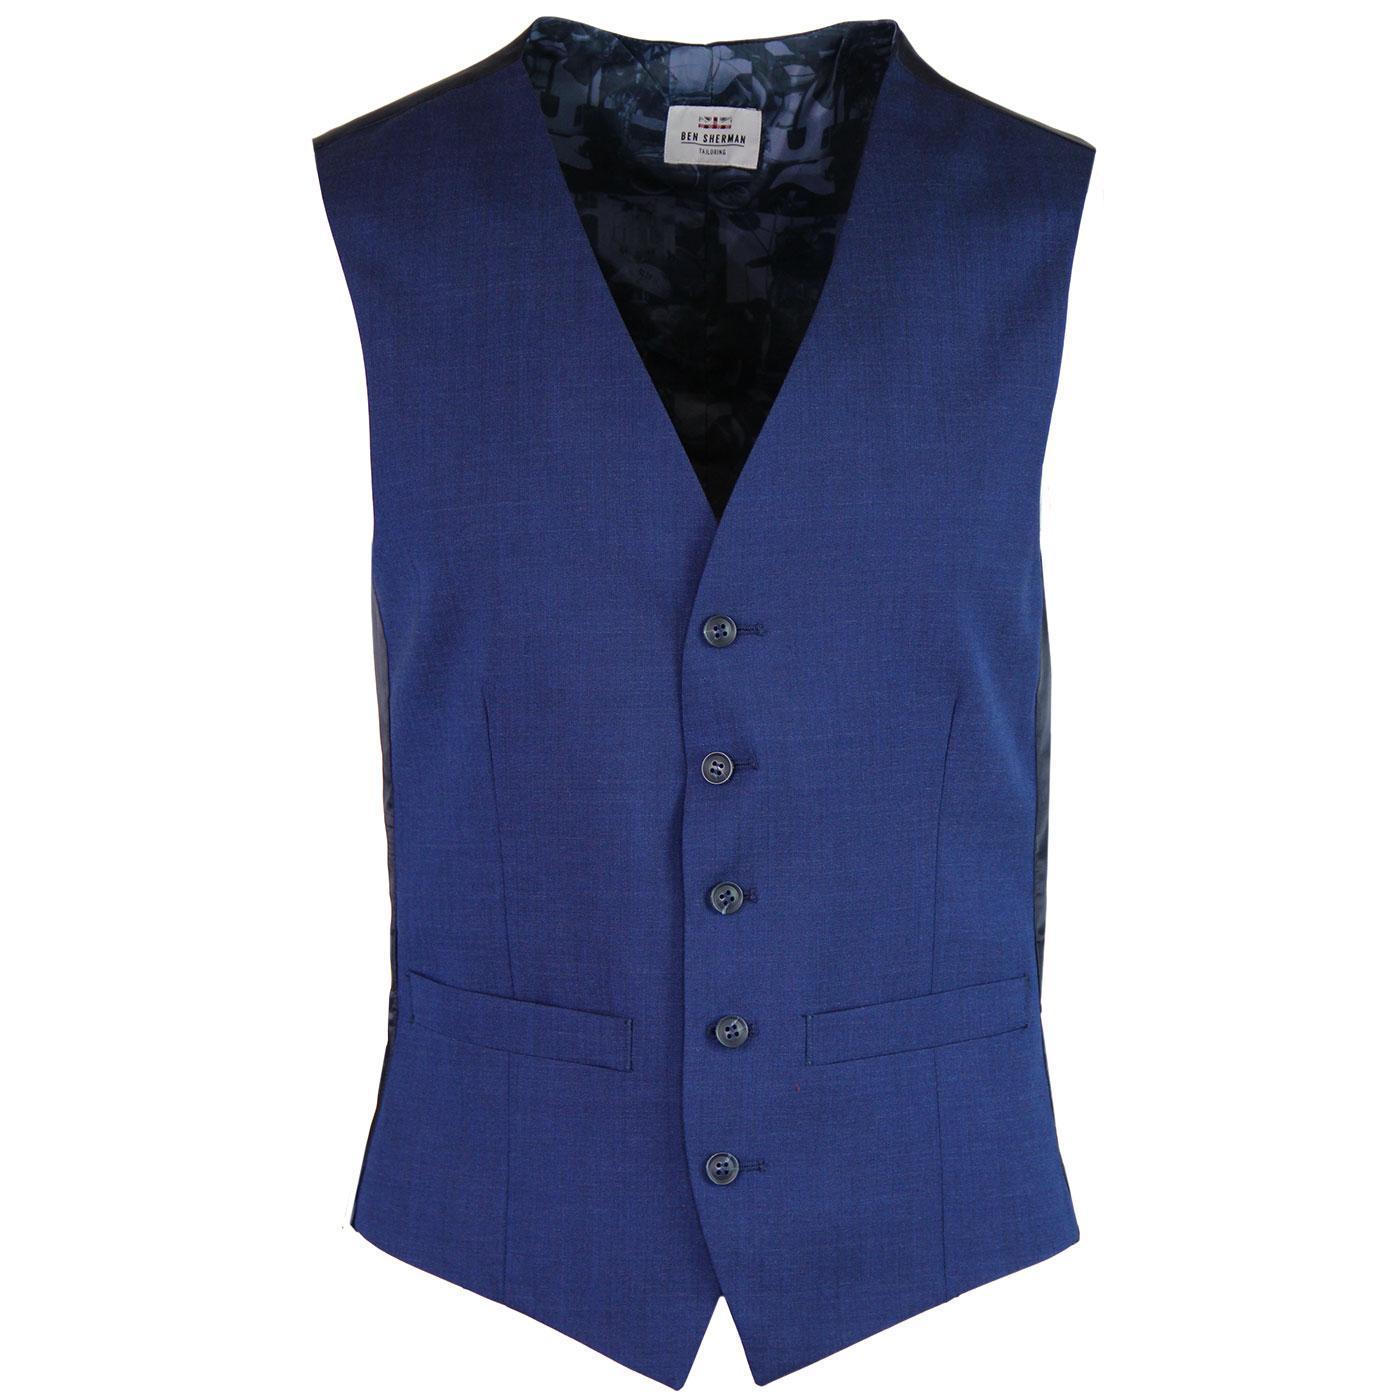 BEN SHERMAN Tailoring 60s Mod Tonic Waistcoat BLUE